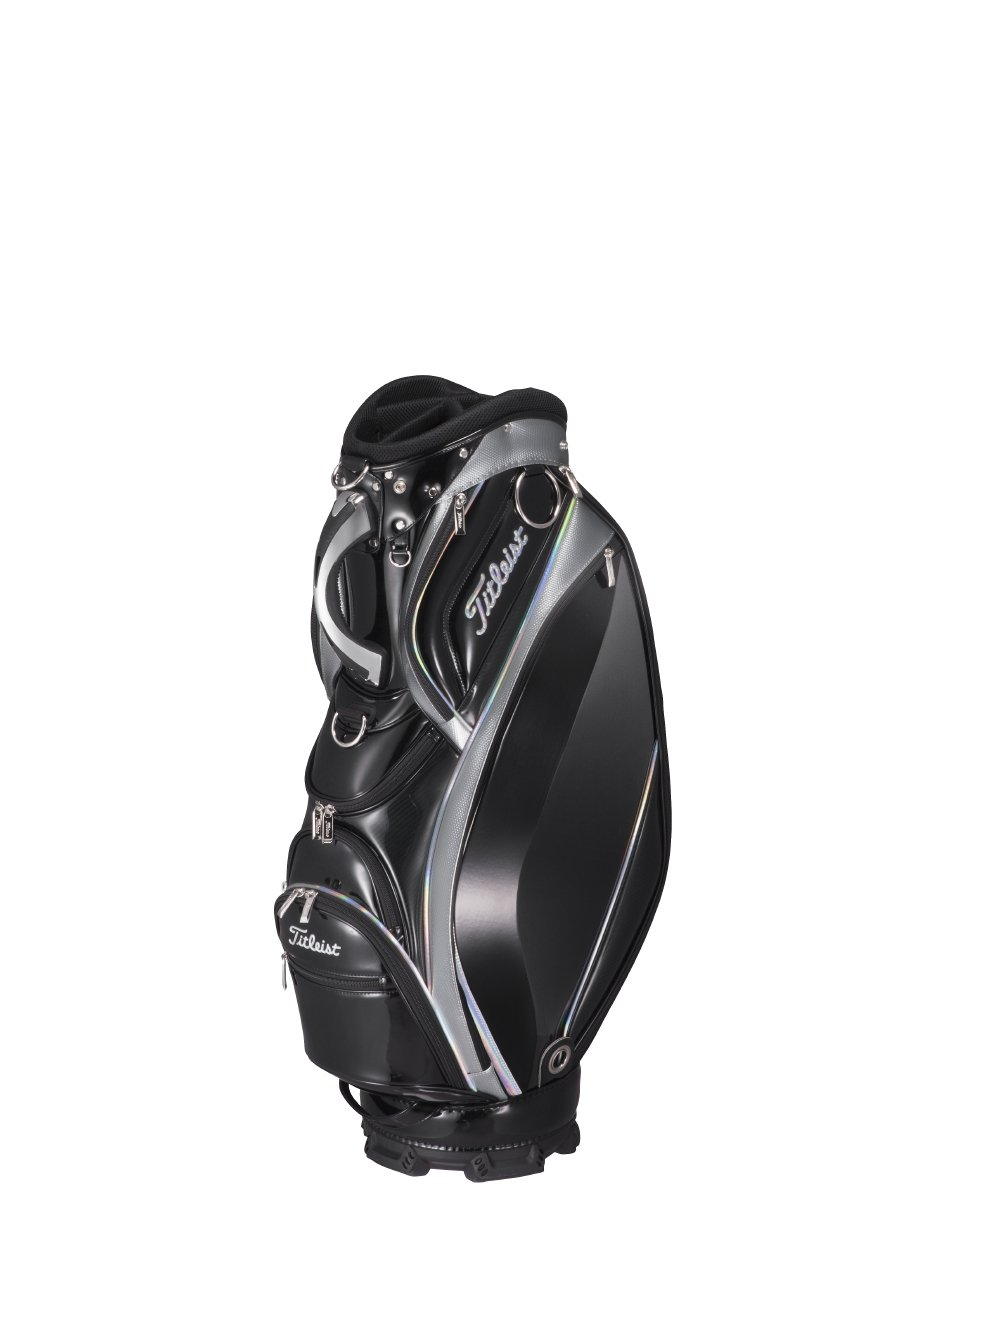 TITLEIST(タイトリスト) キャディーバッグ スタイリッシュ CB813 9.5インチ メンズ CB813-BKSV ブラックシルバー 重さ:4.7kg クラブの長さ対応:47インチ B079GVHJC8